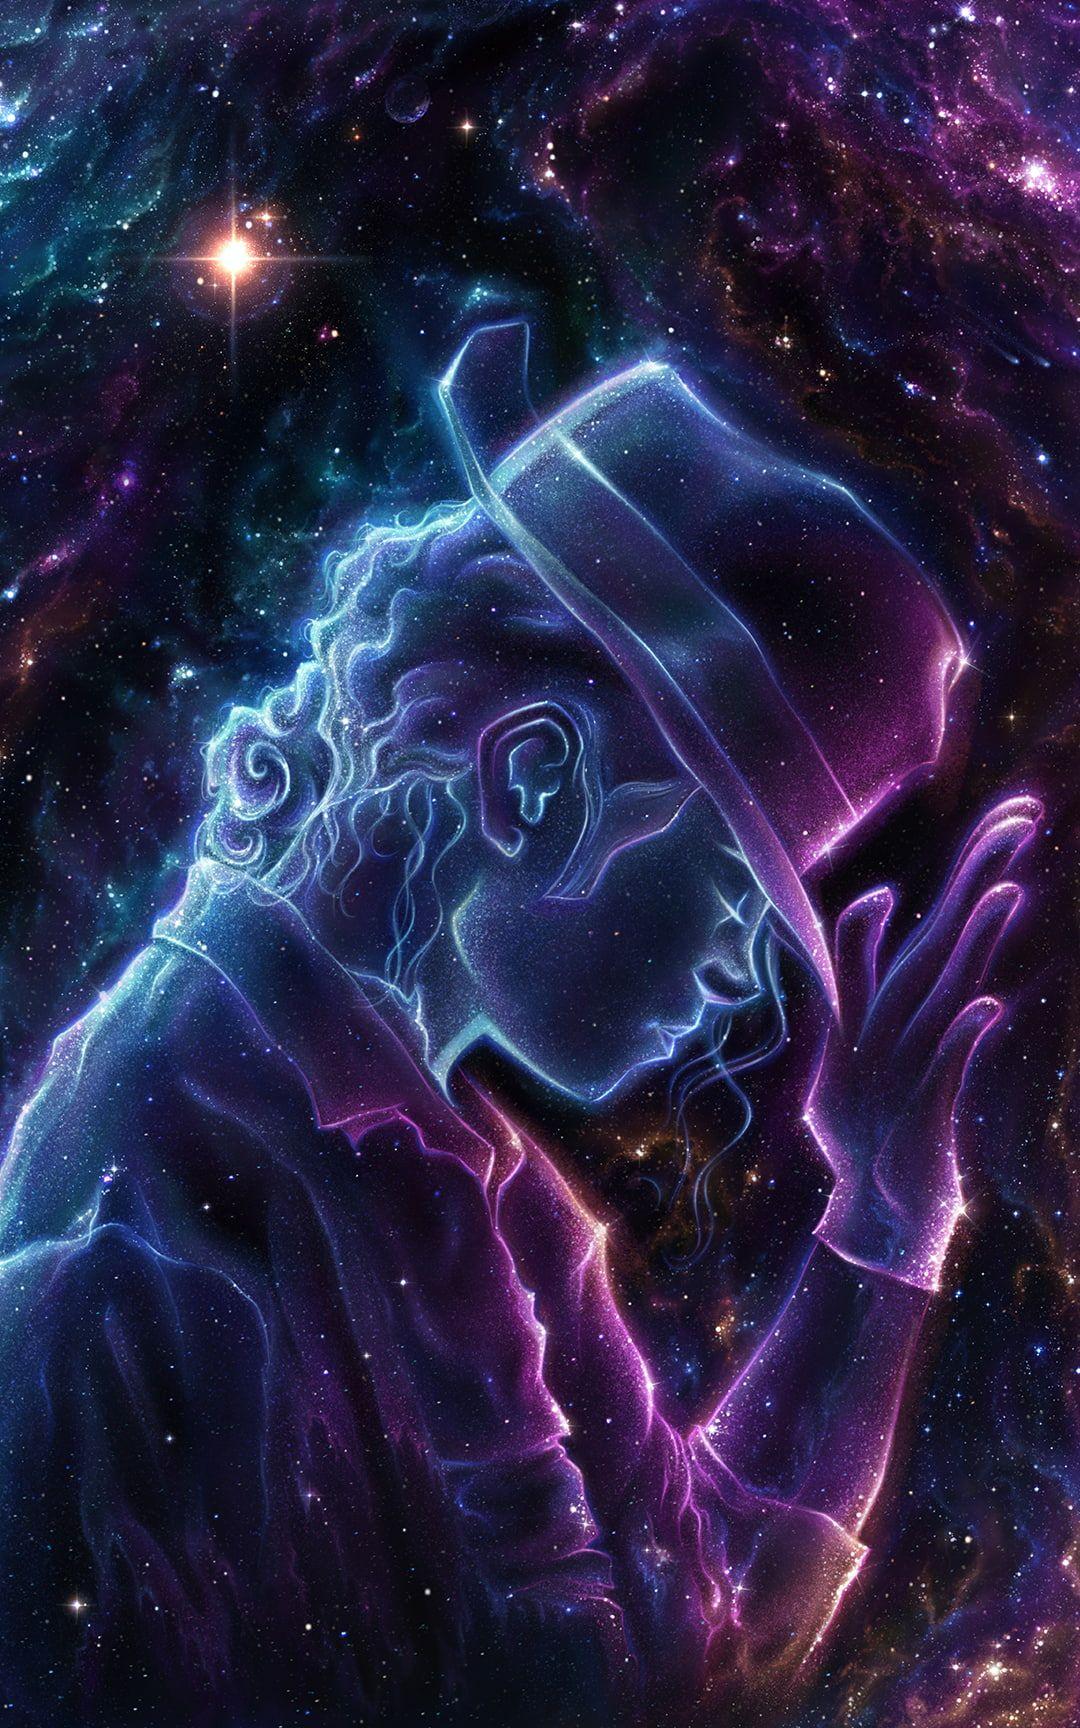 Michael Jackson Fan Art Celebrity Space Art Universe Fantasy Art